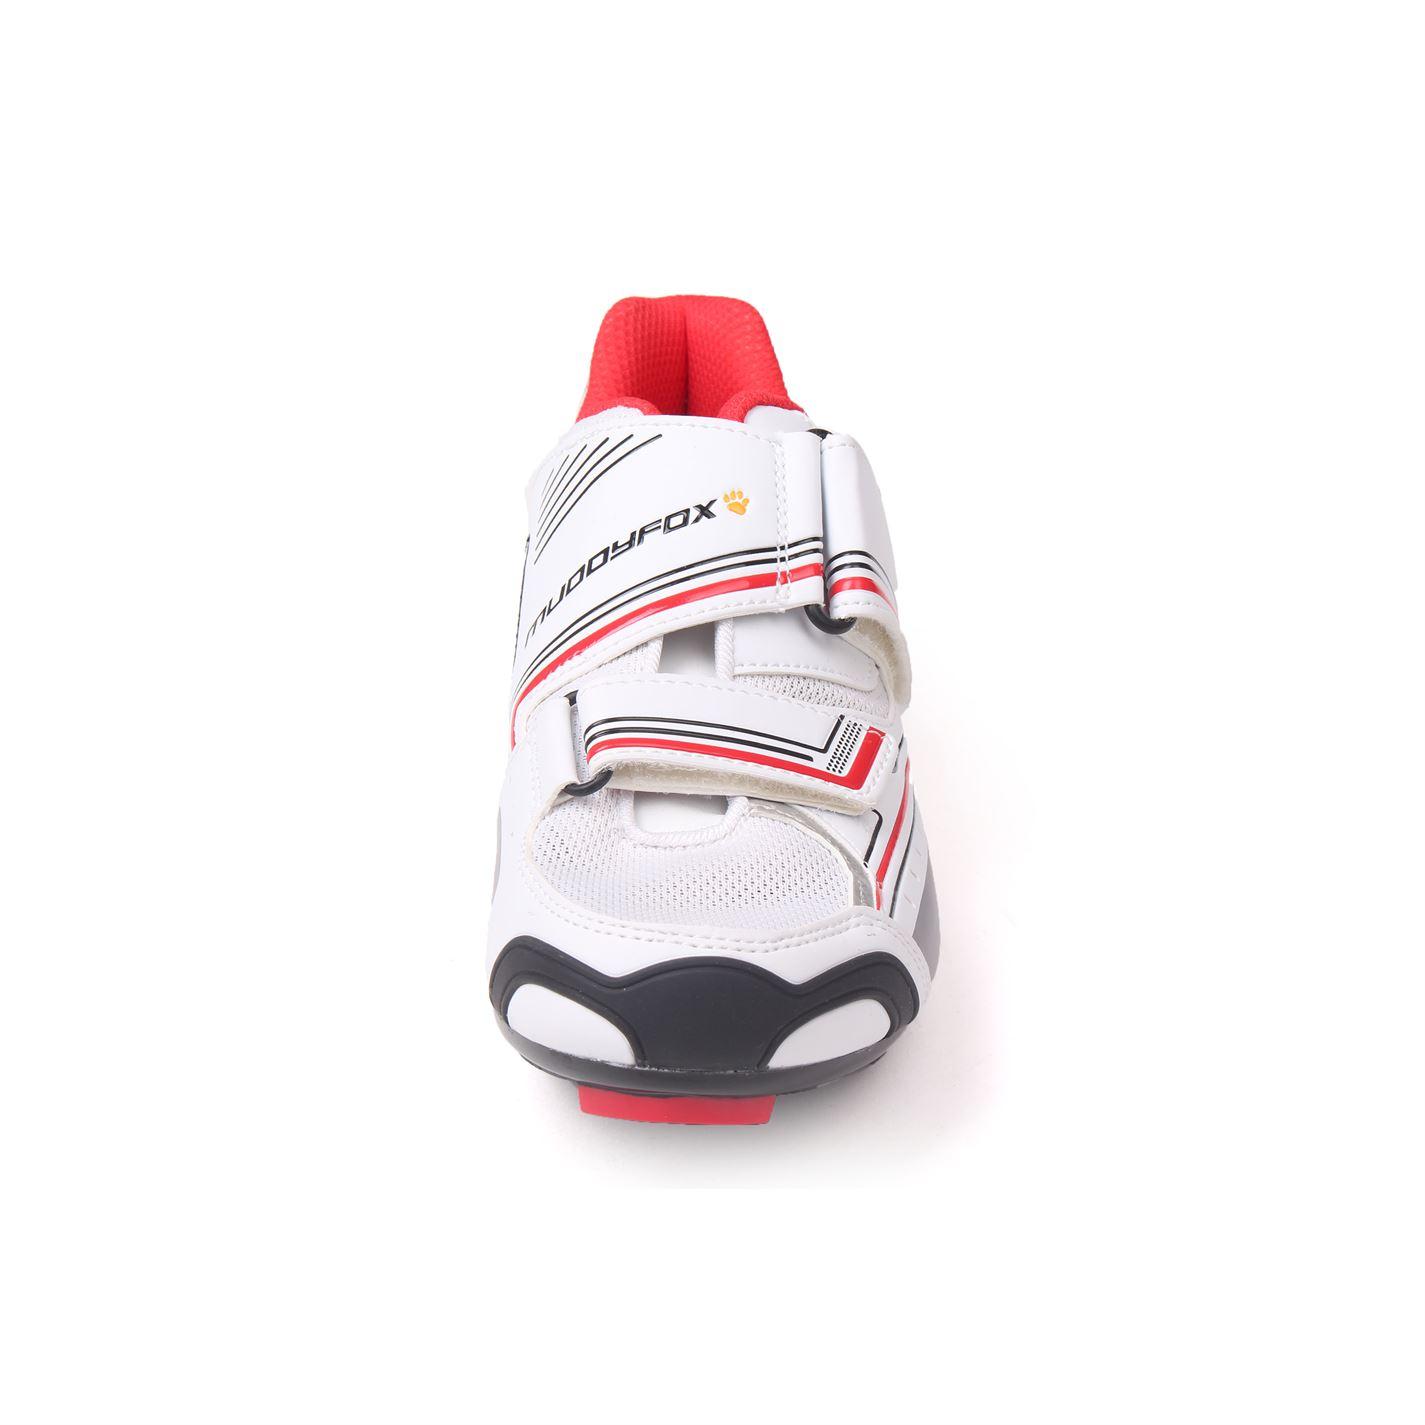 Muddyfox Kids RBS100 Junior Cycling Cushioned Shoes Cycle Trainers Mesh Panels